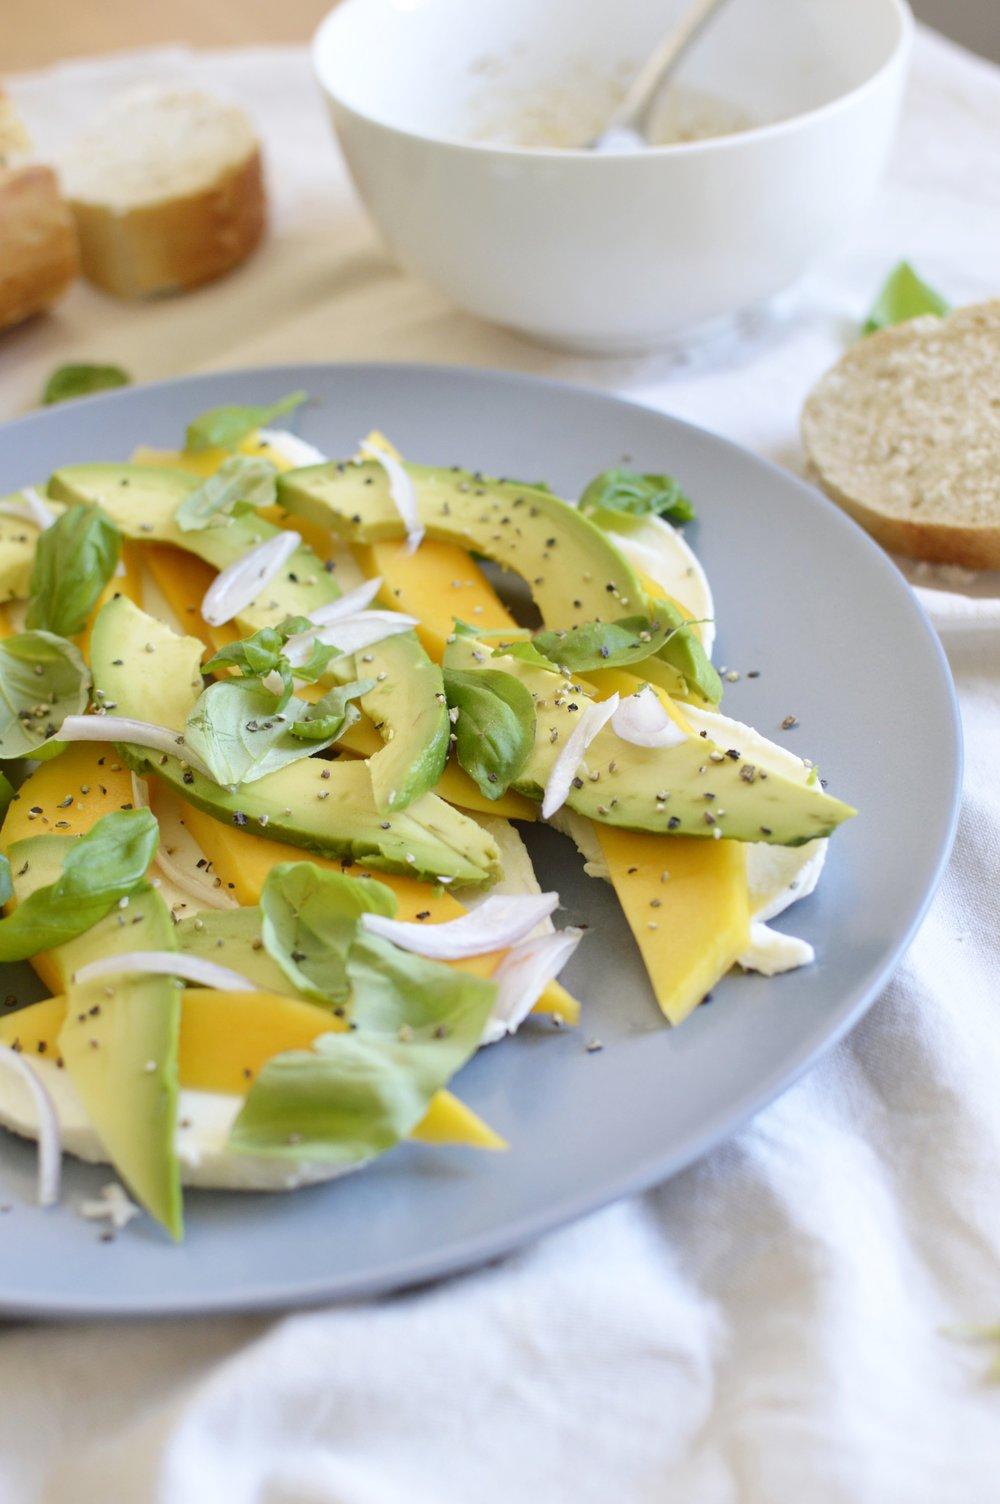 Avocado-Mango-Mozzarella-Caprese-lowcarb-ideen-rezept